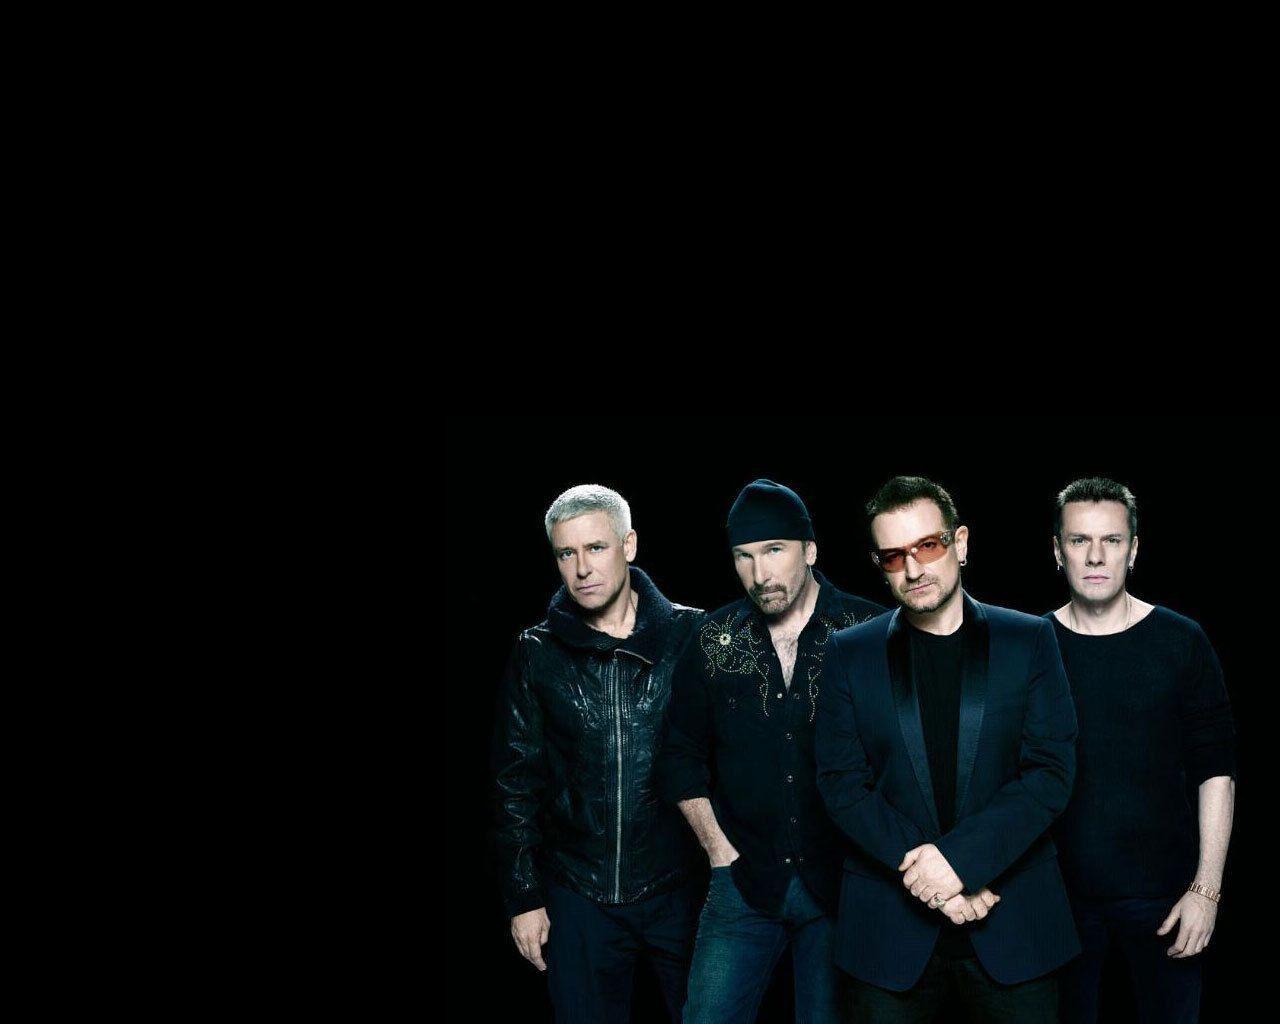 U2 Wallpapers - Wallpaper Cave